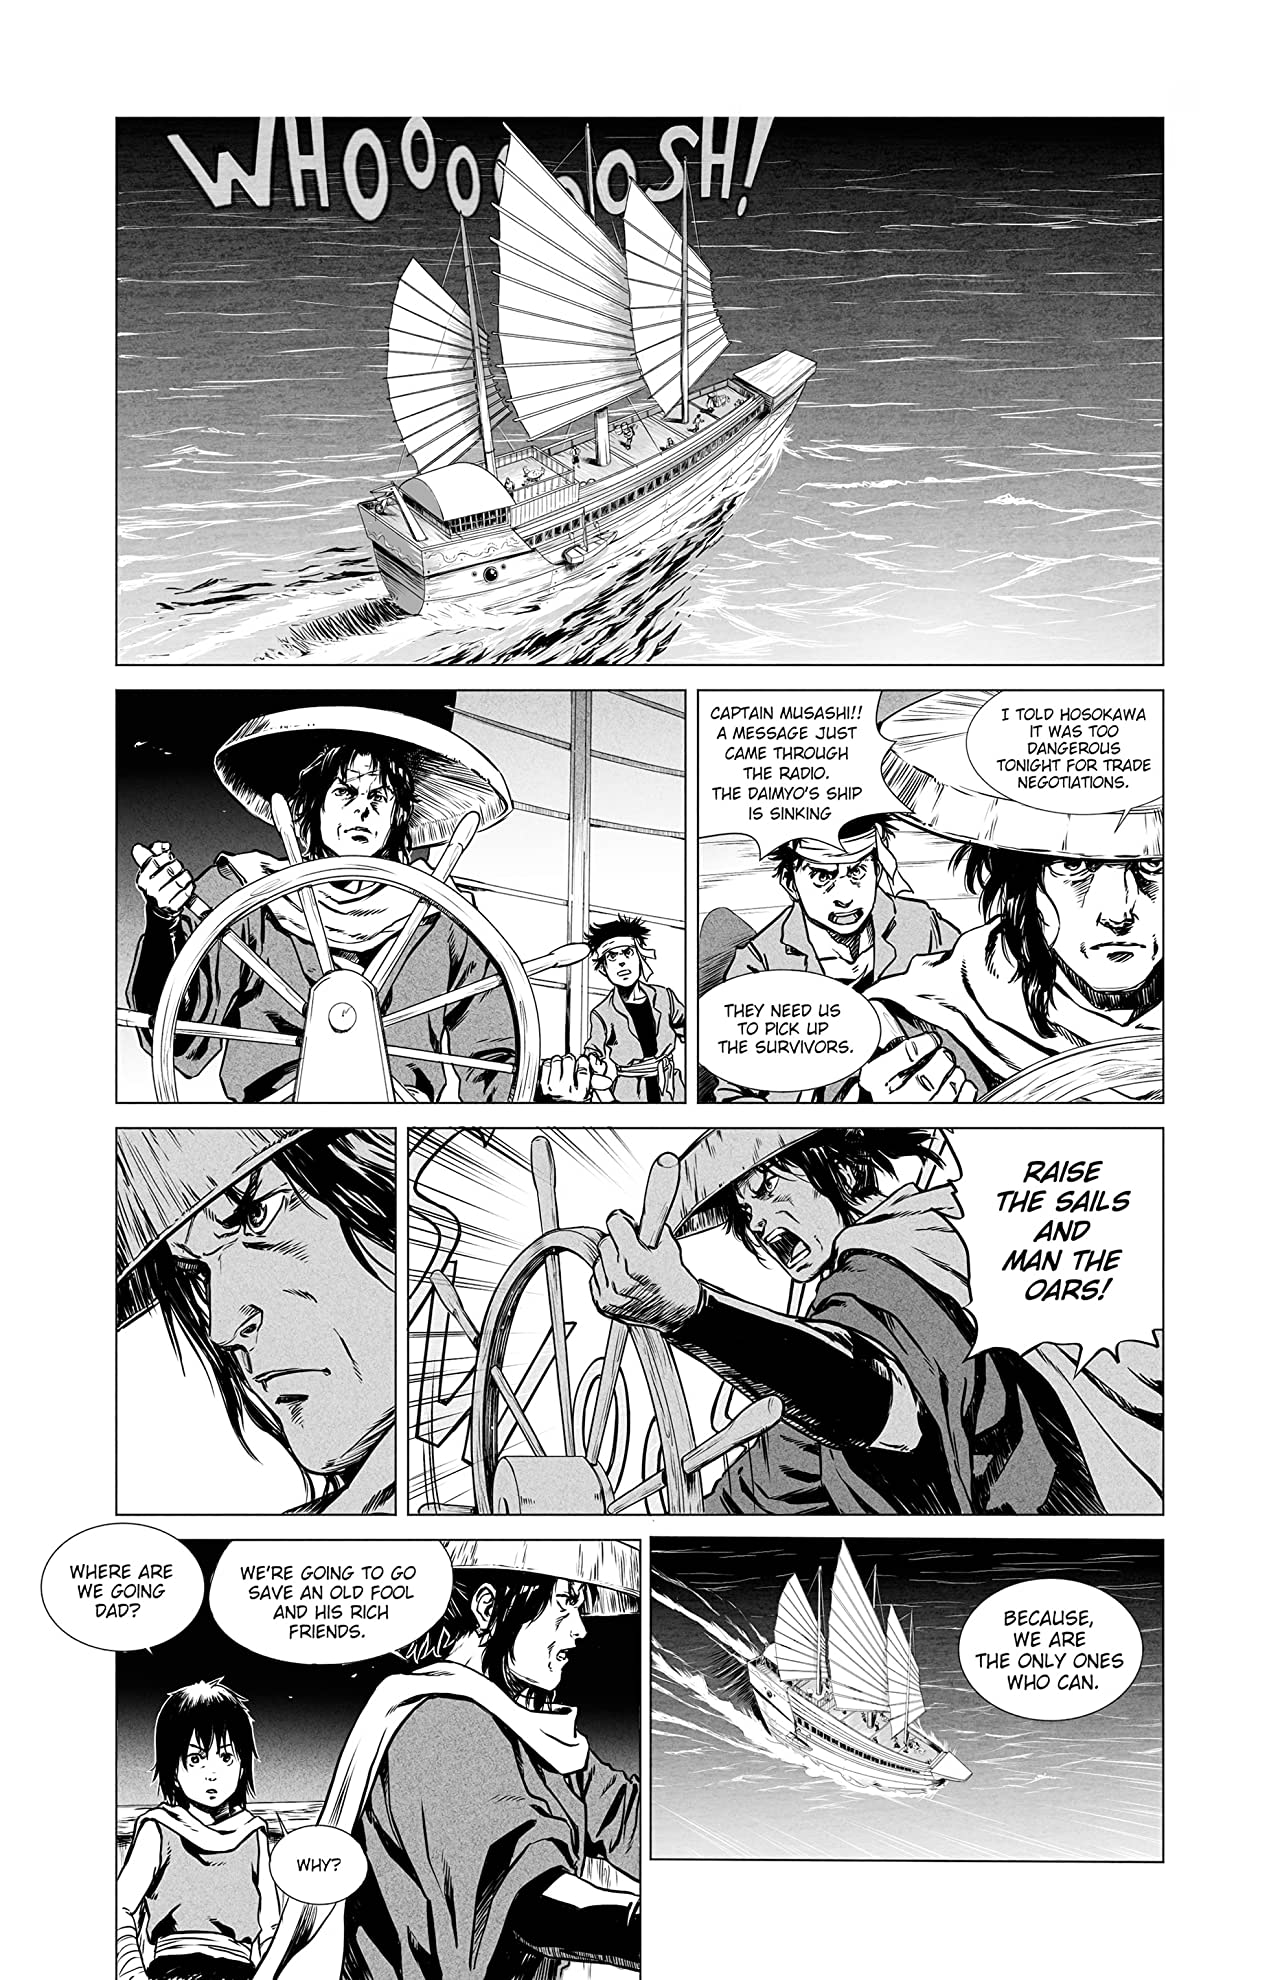 Flowing Blade Bushido #1